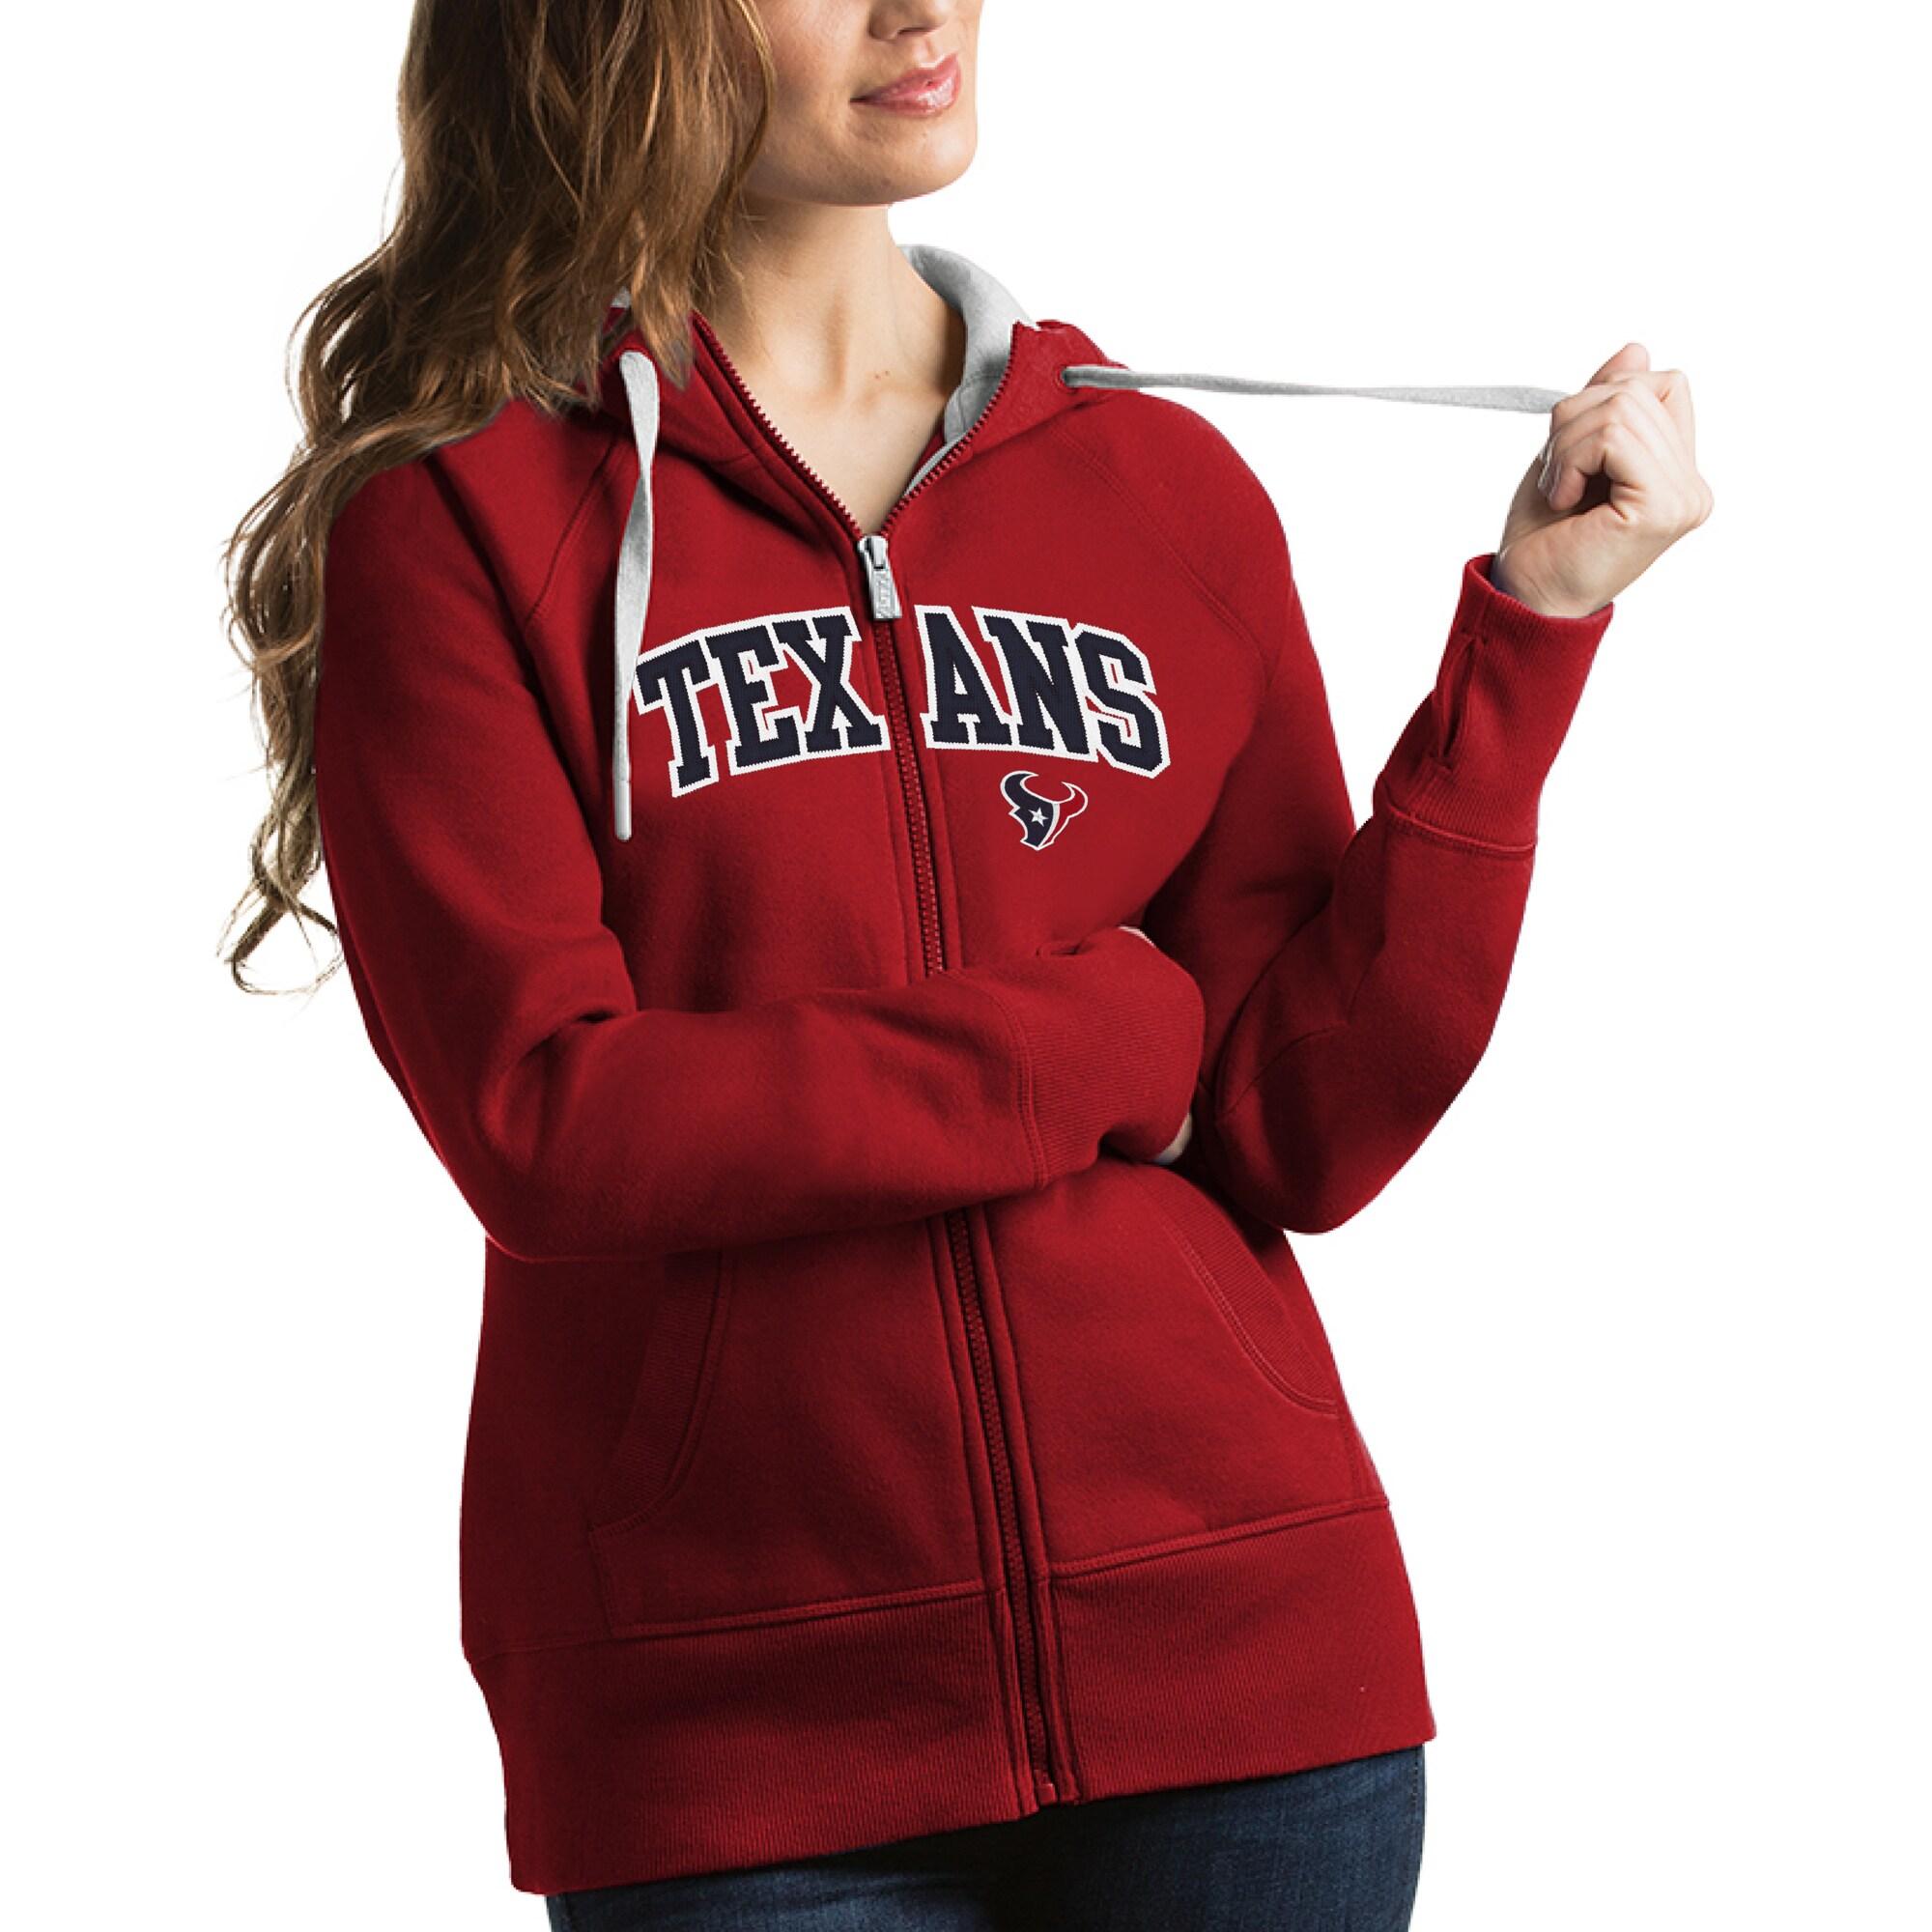 Houston Texans Antigua Women's Victory Full-Zip Hoodie - Red